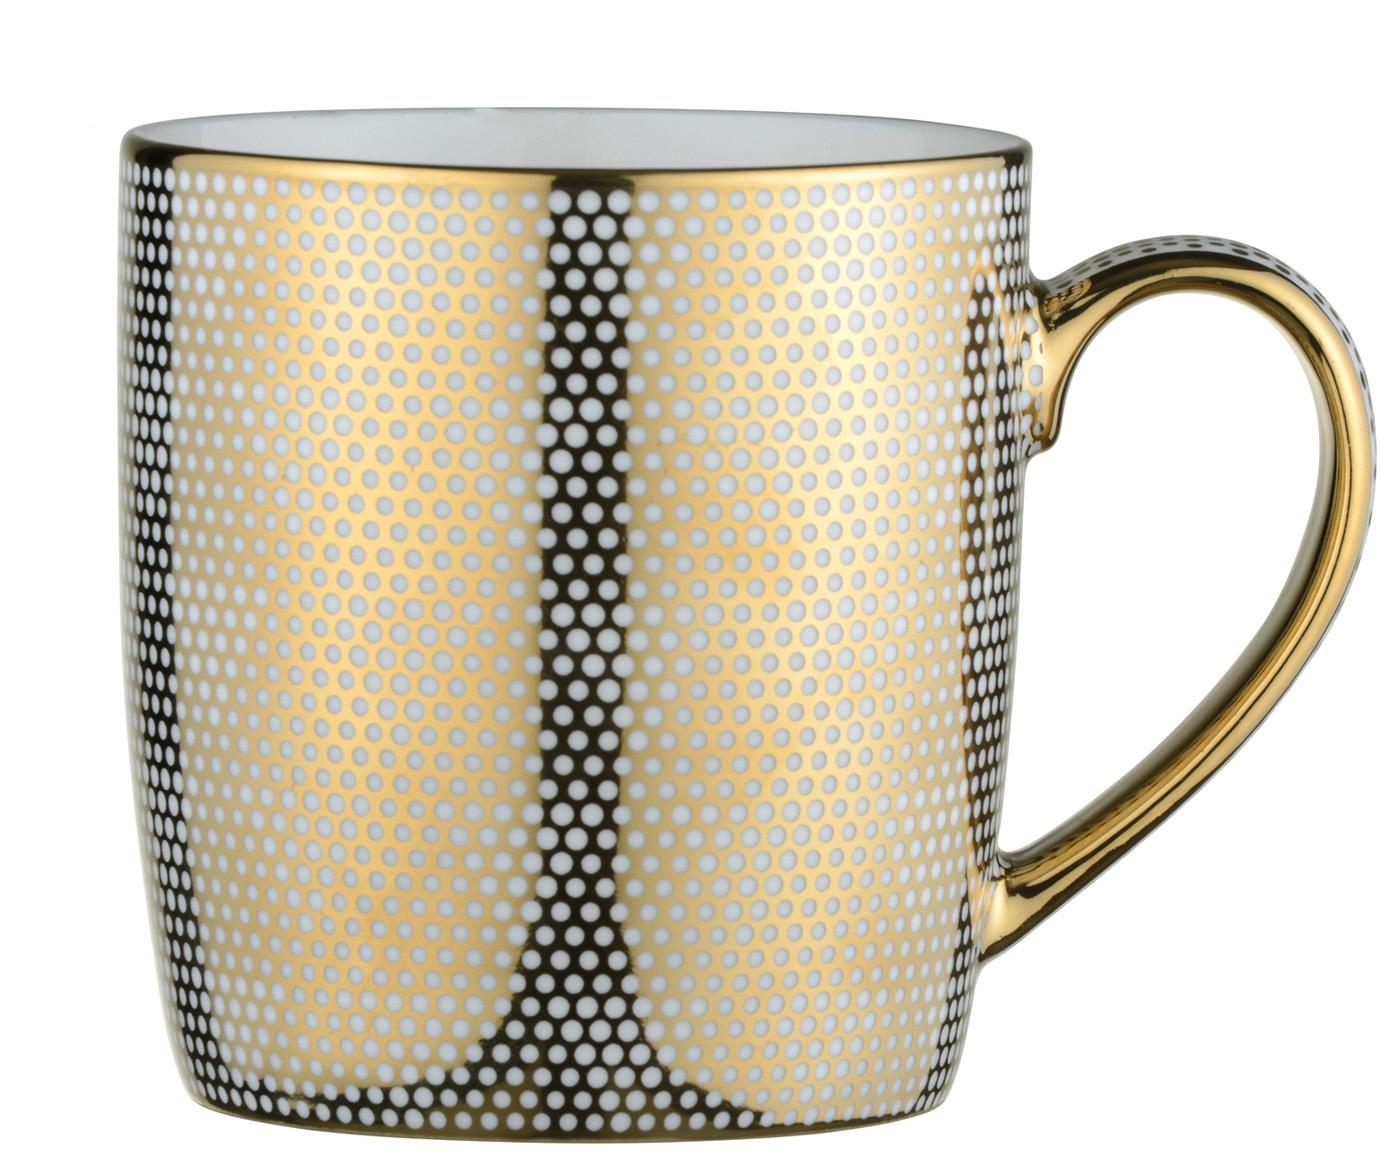 Tassen Dots, 4 Stück, Porzellan, Weiß, Goldfarben, Ø 9 x H 10 cm